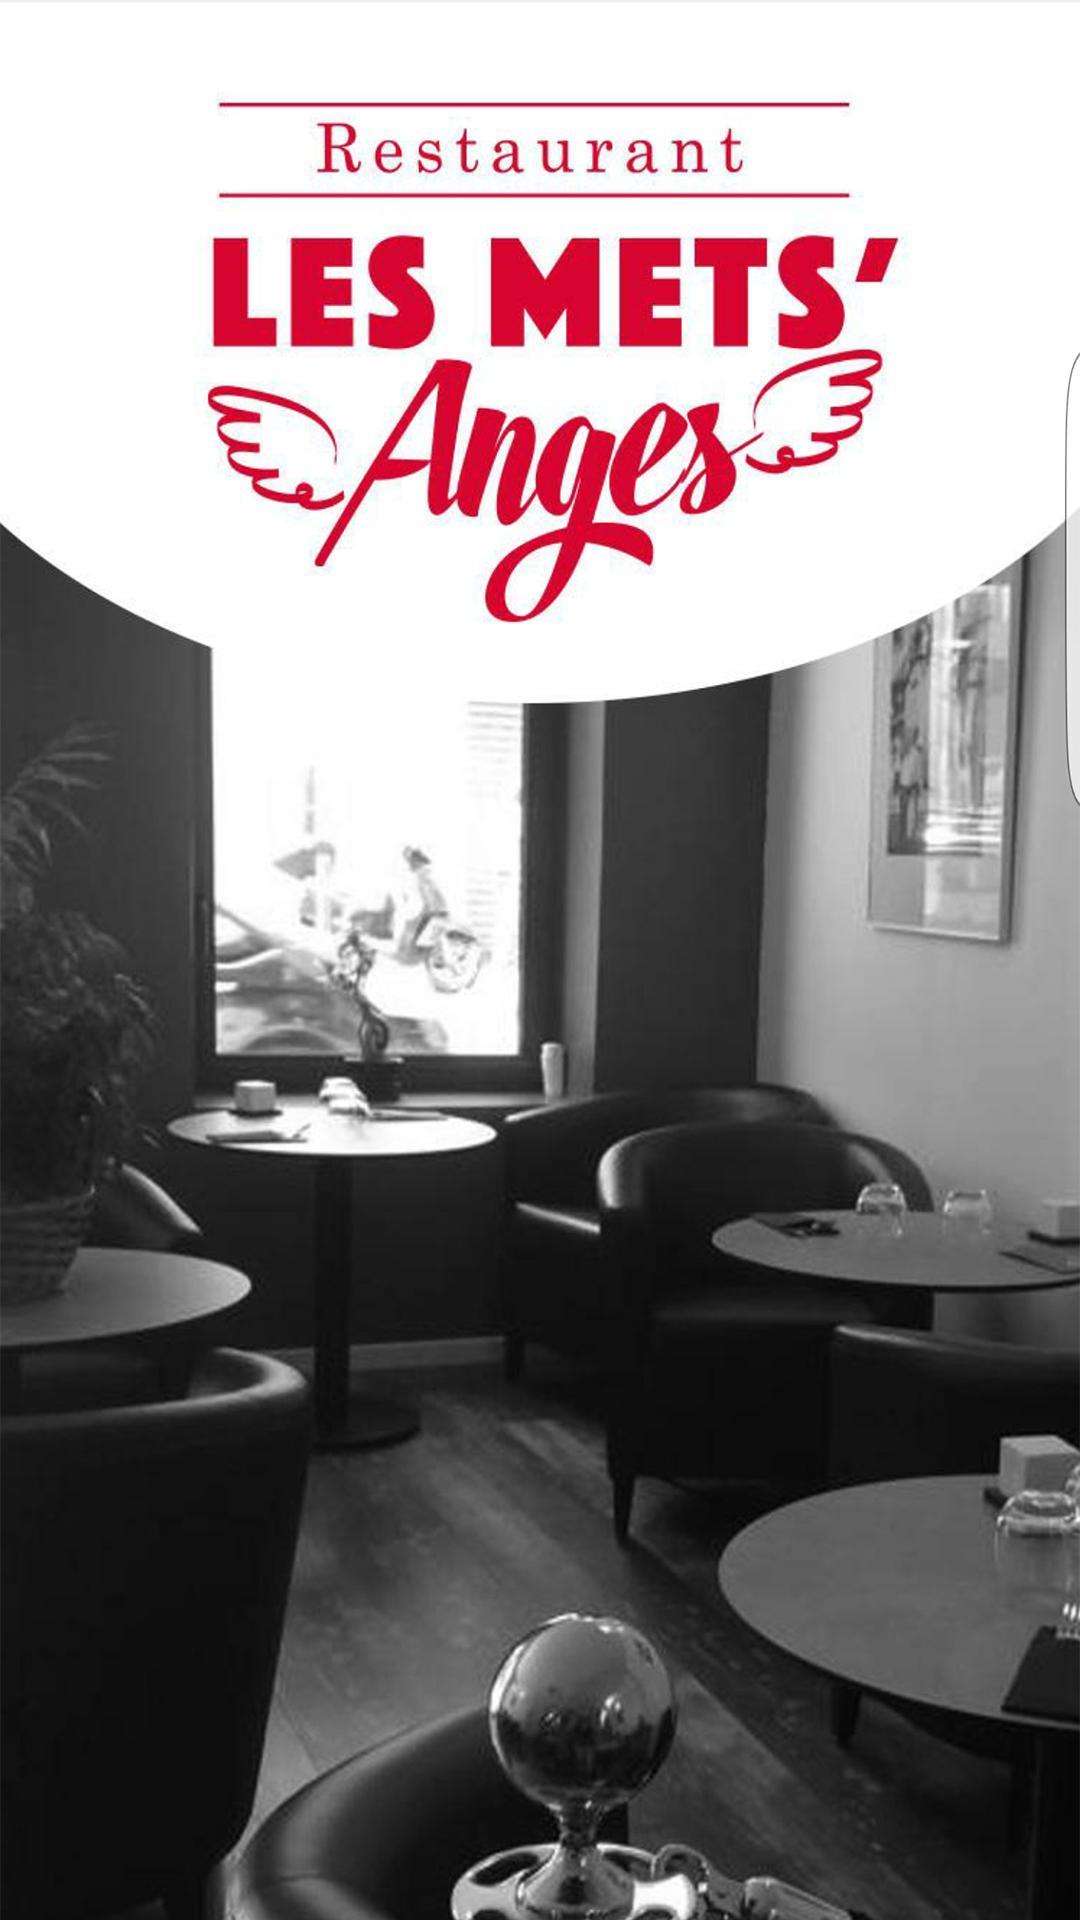 Restaurant Les Mets'Anges 3